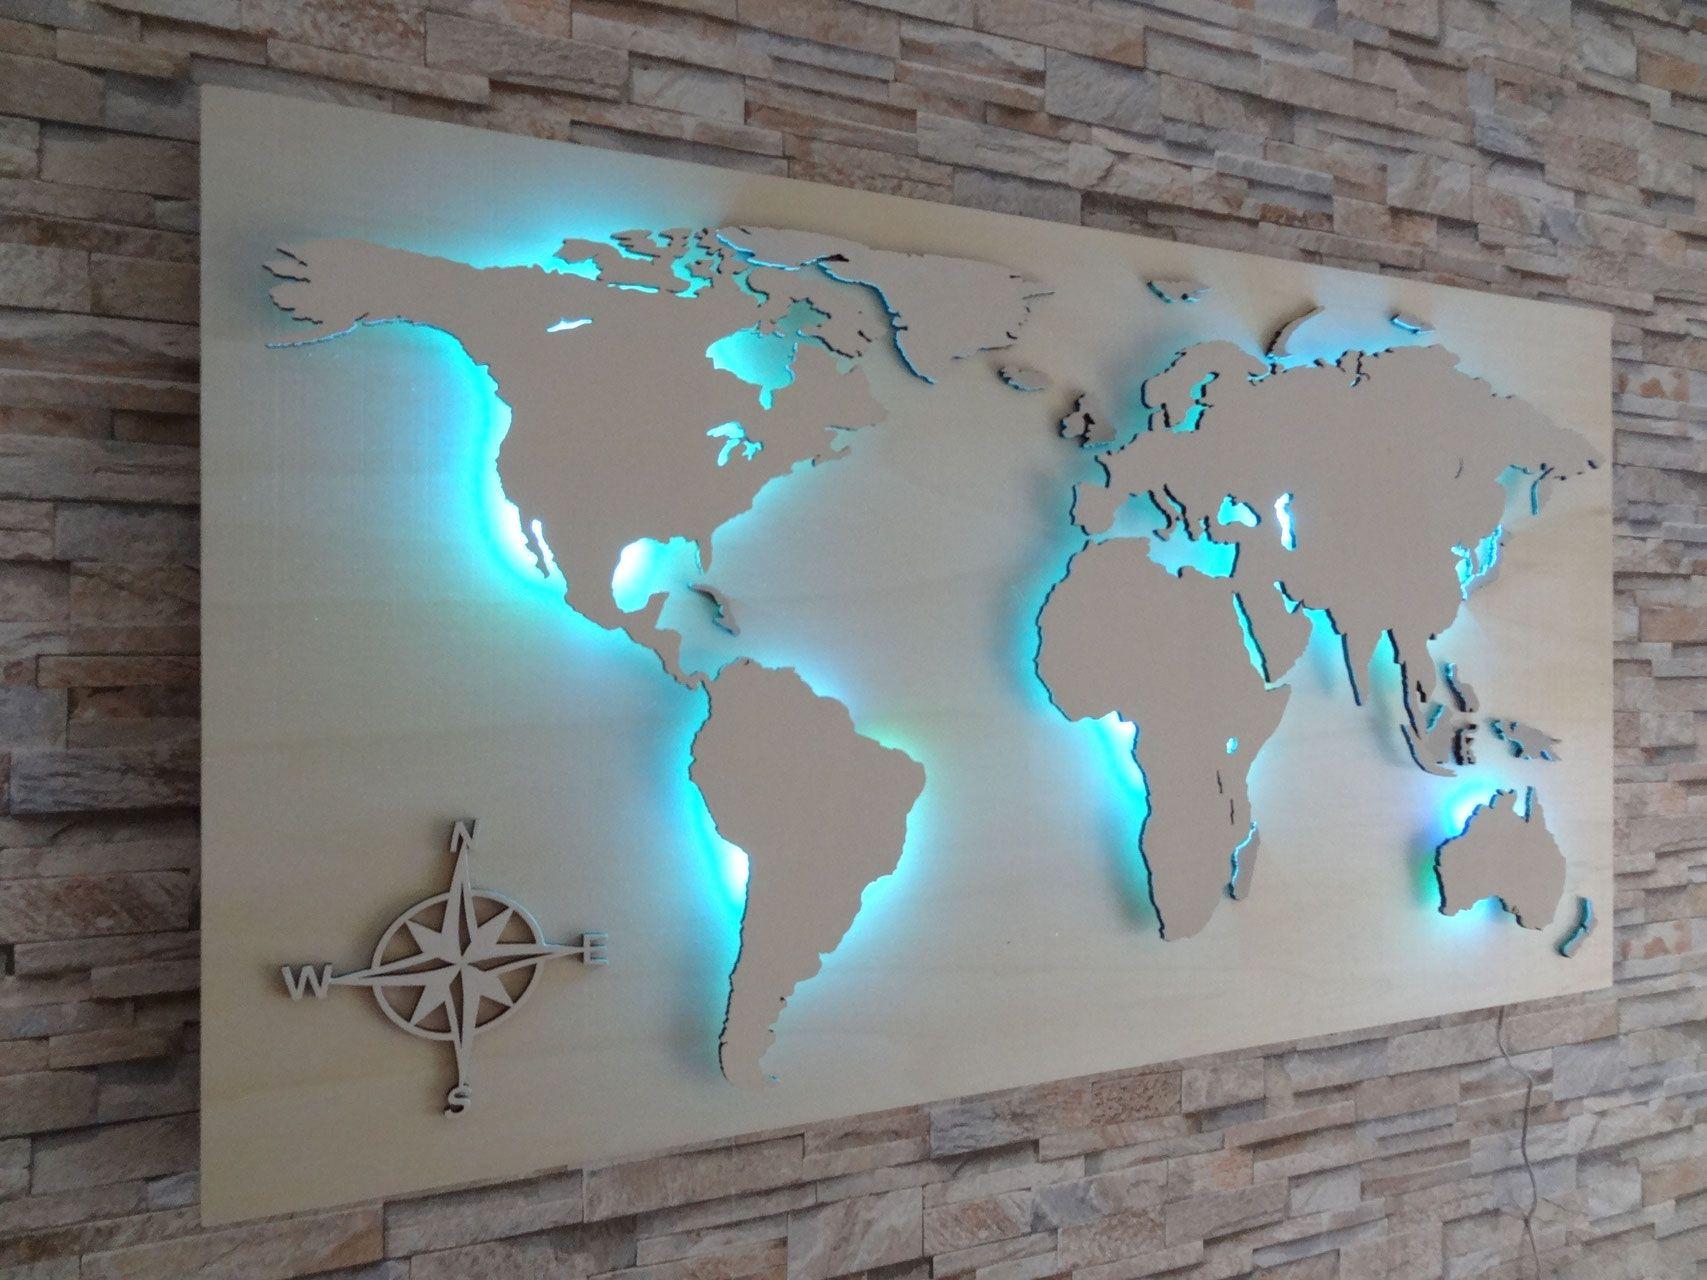 Weltkarte Aus Holz Led Beleuchtung Kompass In 2020 Weltkarte Aus Holz Weltkarte Kunst Weltkarte